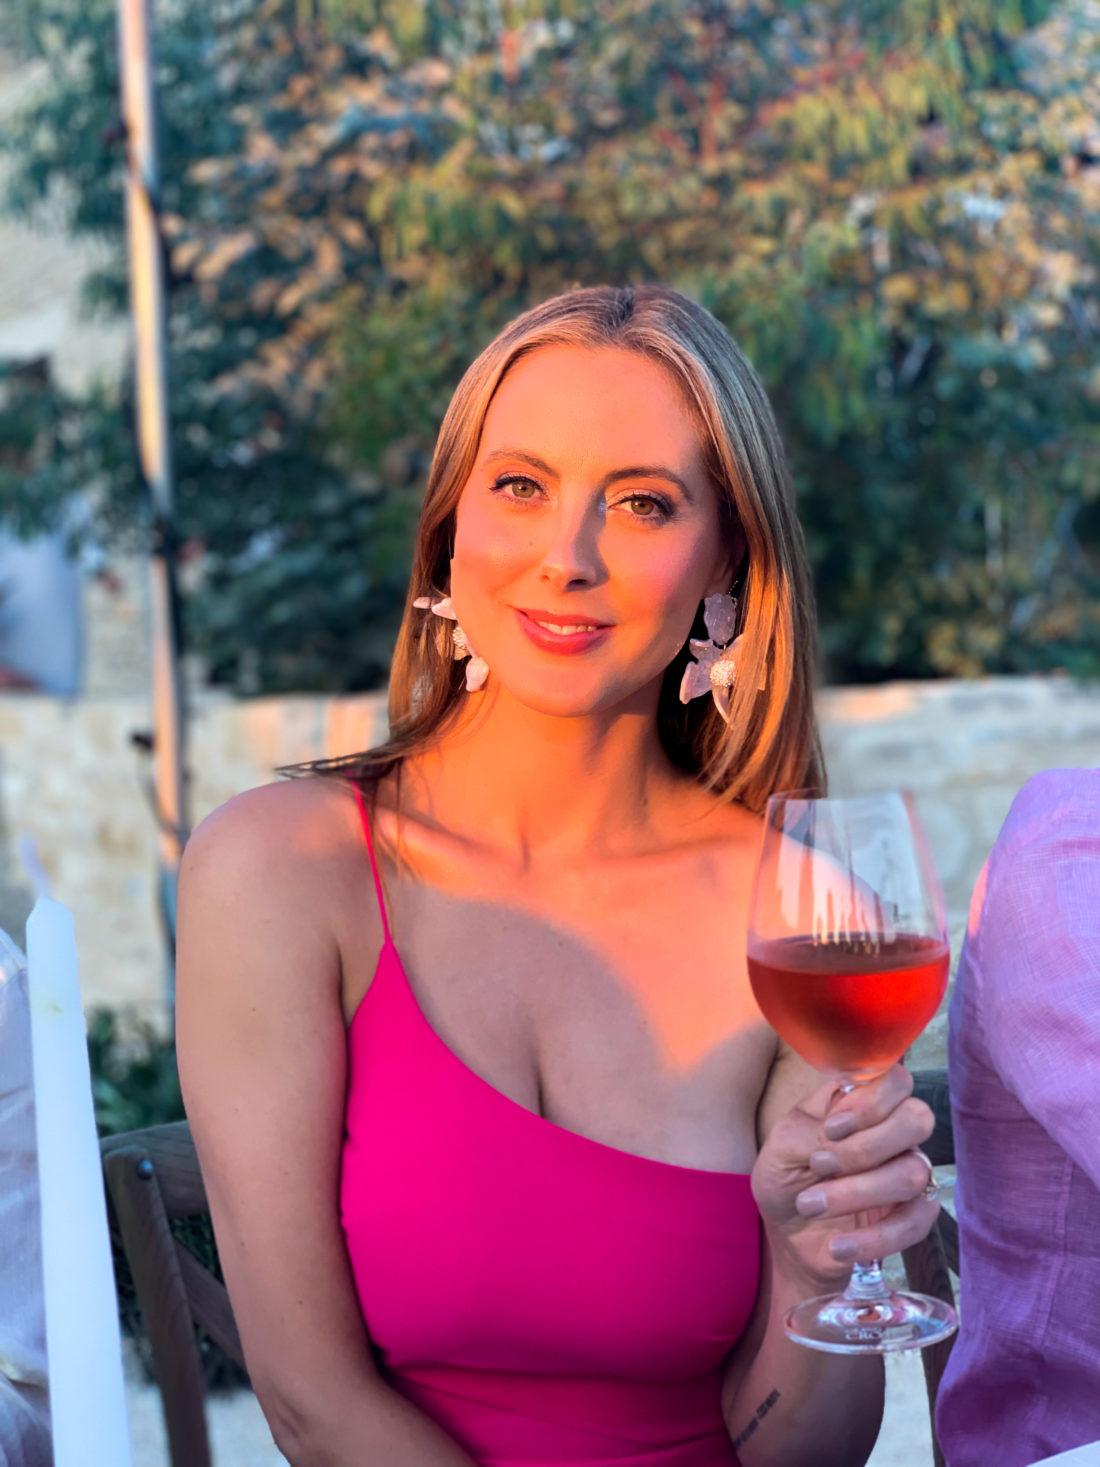 Eva Amurri Martino sips a glass of rosé at a wedding in Croatia